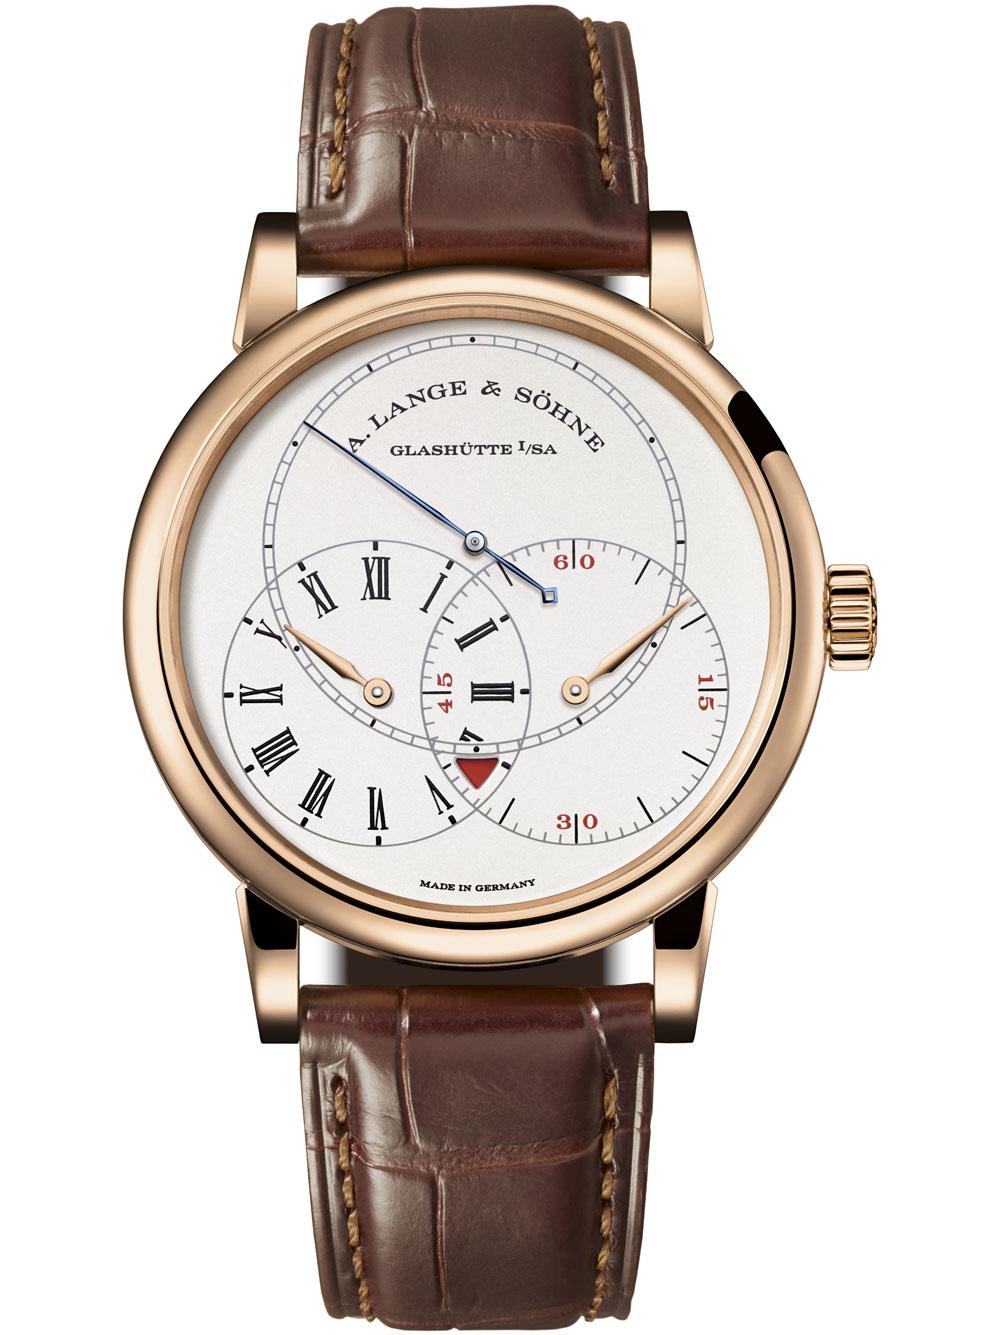 Reloj RICHARD LANGE JUMPING SECONDS de A. Lange & Söhne